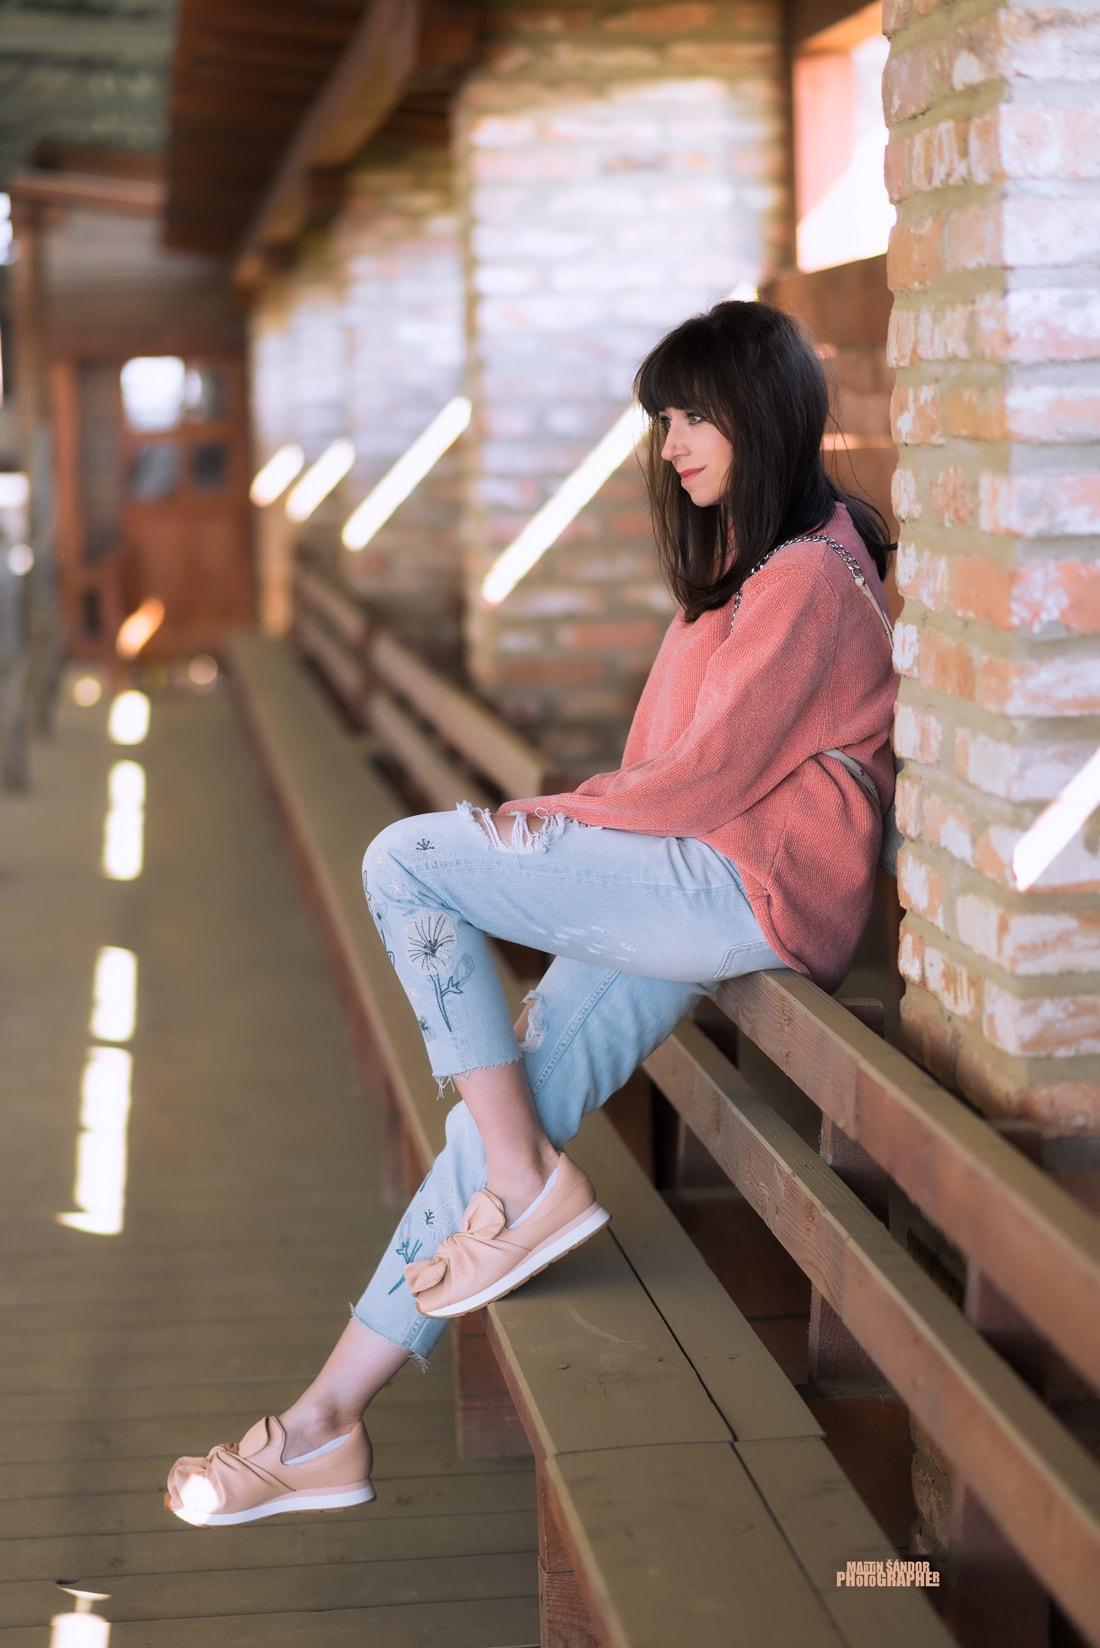 SPOMIENKA NA SVETER VĎAKA ZARE_Katharine-fashion is beautiful_Blog 5_Ženilkový sveter zo Zary_Vyšívané džínsy_Tenisky s mašľou_Katarína Jakubčová_Fashion blogger